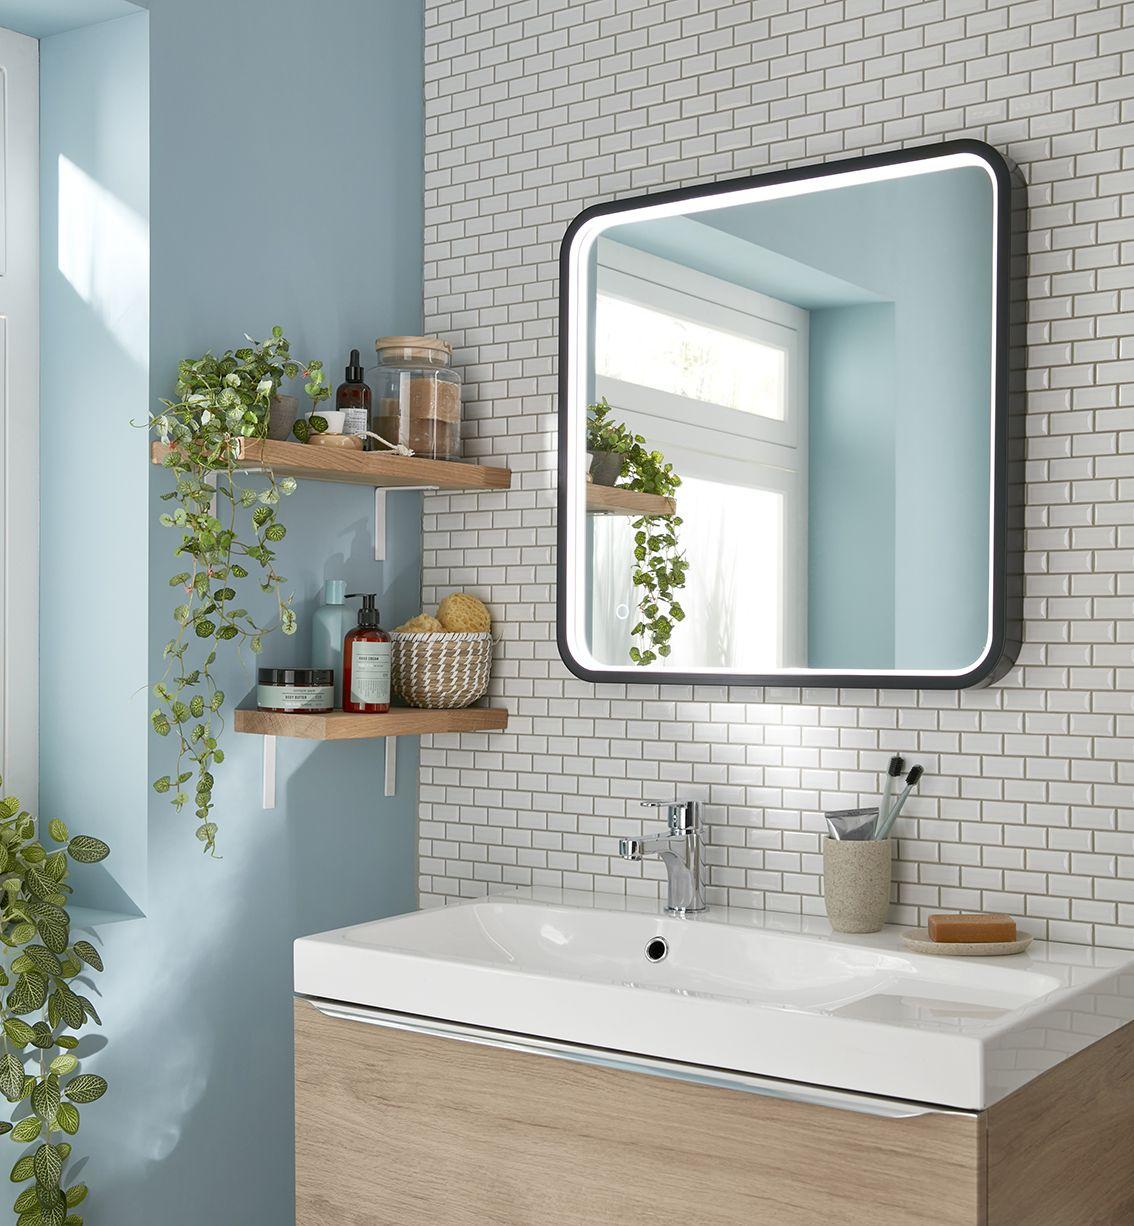 Perfect Miroir Salle De Bain Led Castorama